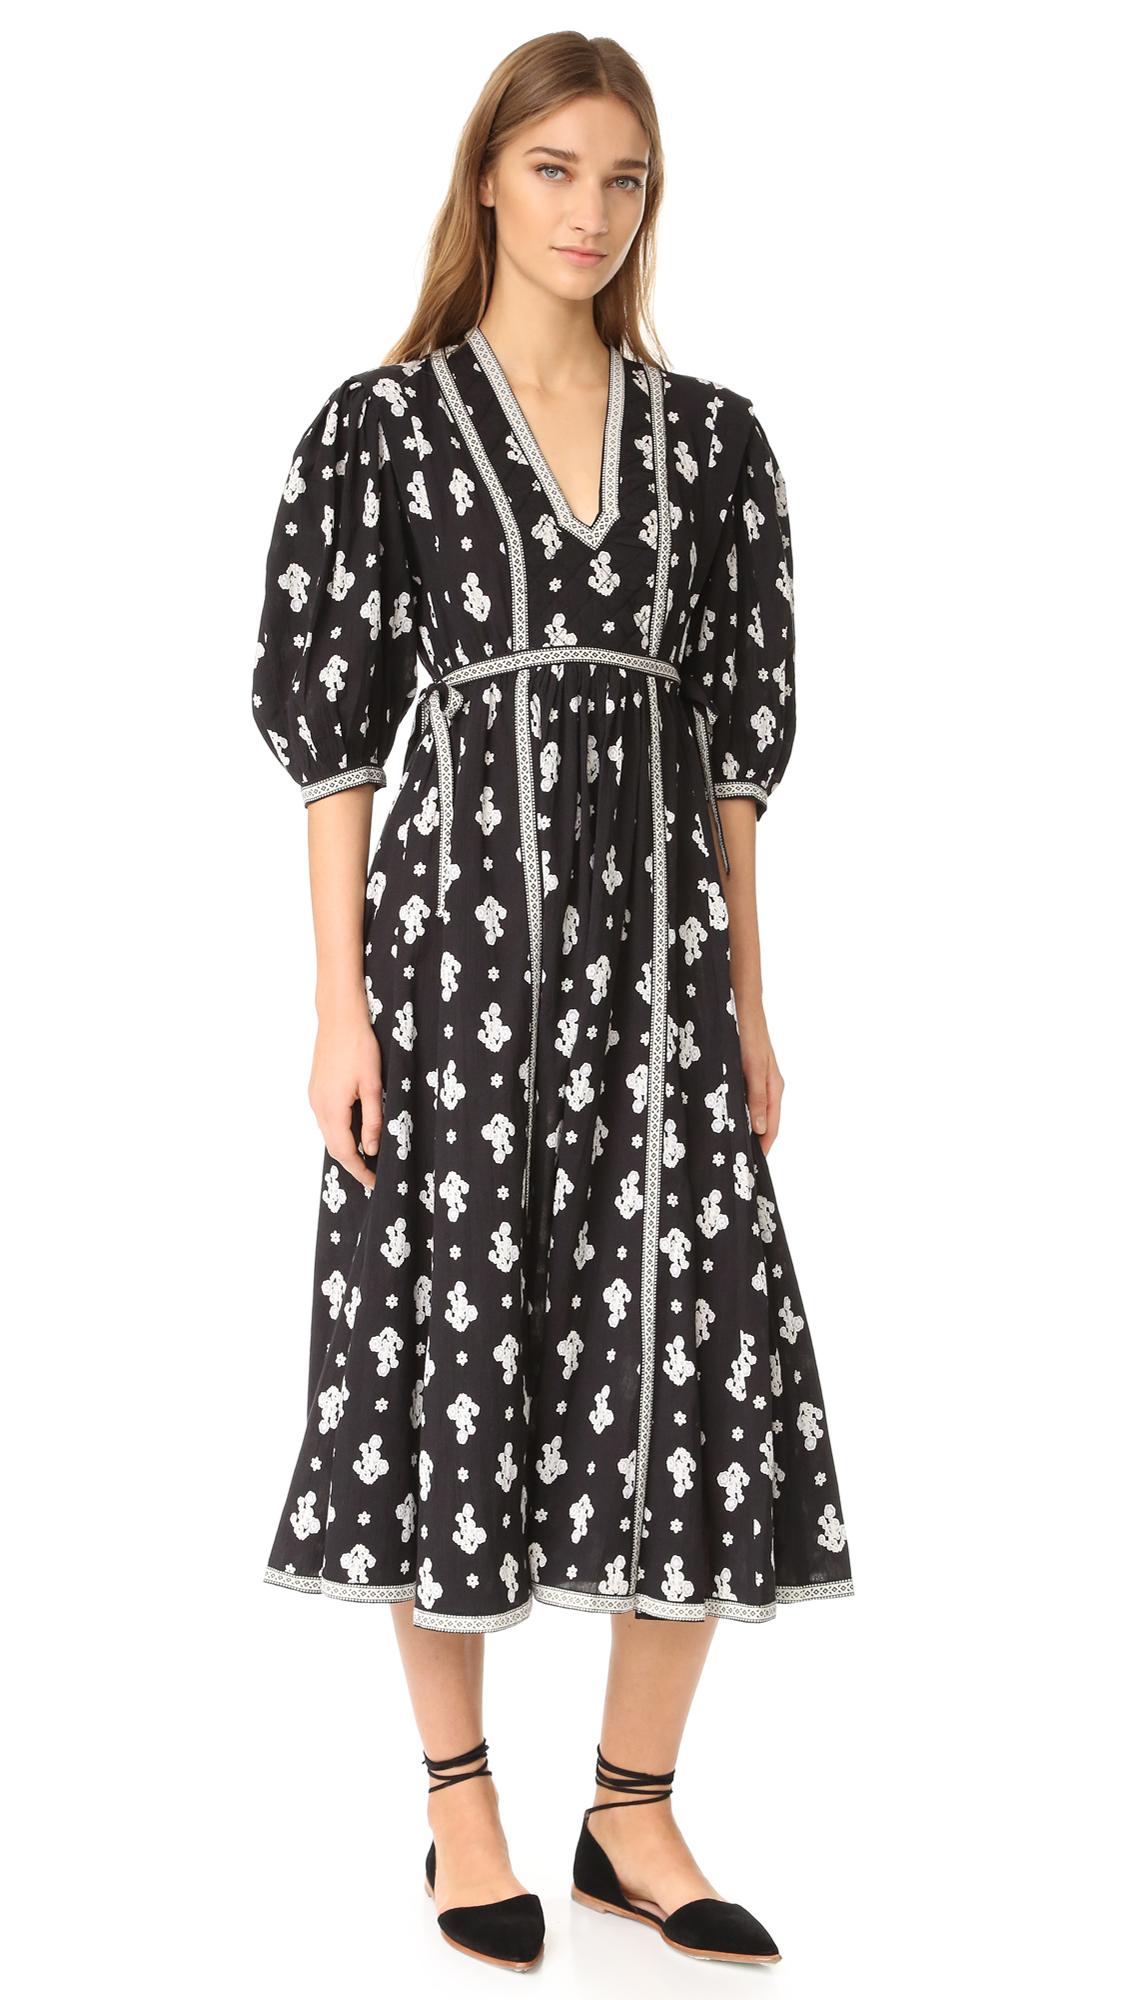 La Vie Rebecca Taylor Long Sleeve Blanche Fleur Dress - Black Combo at Shopbop